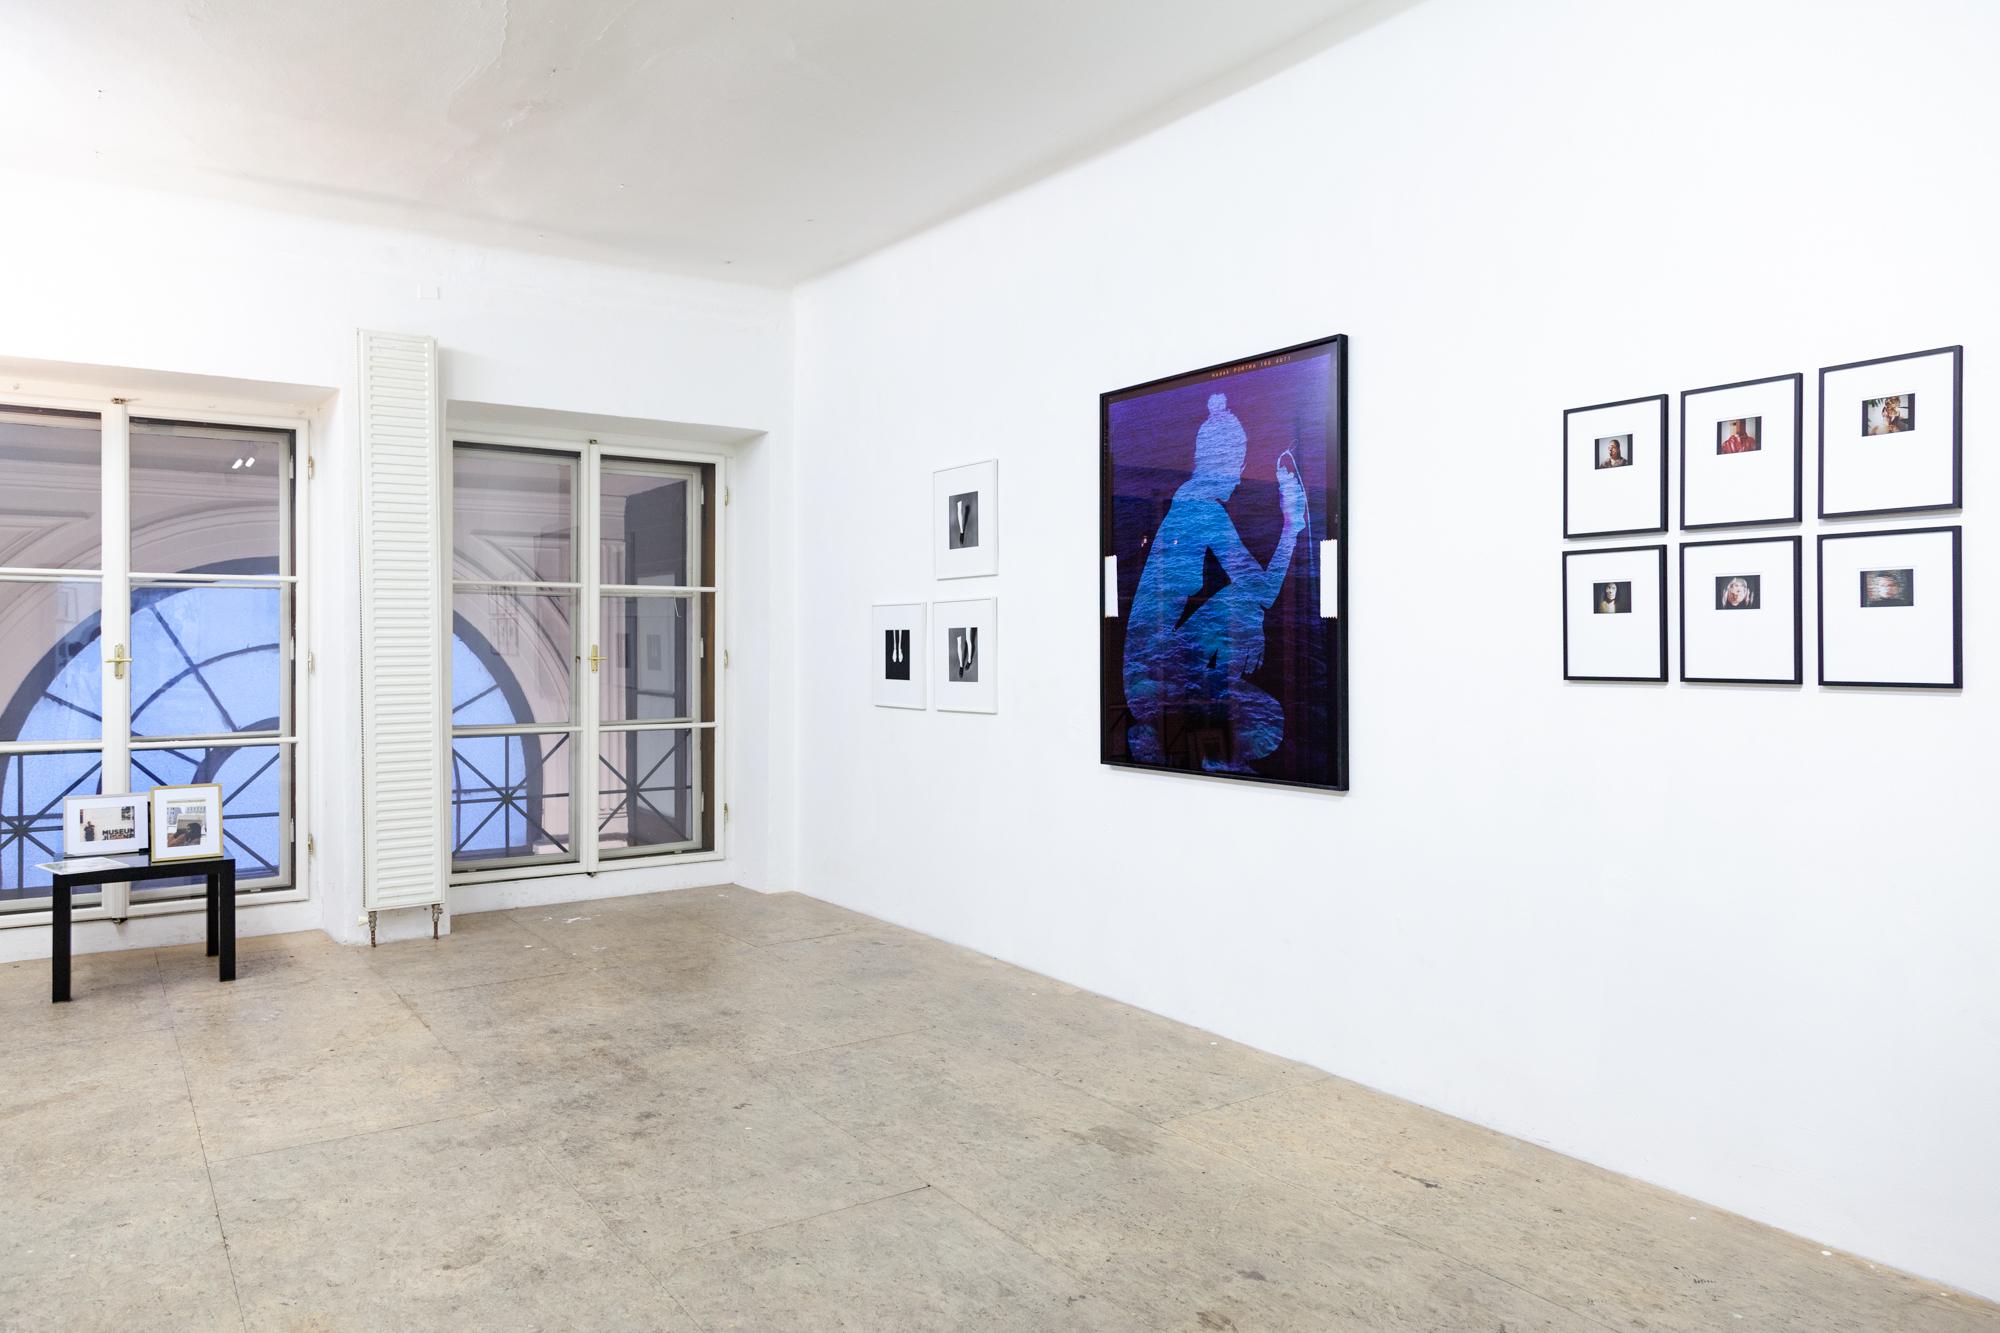 Installationsansicht: Elke Silvia Krystufek, Kerstin von Gabain, Sohie Thun, Crystin Moritz